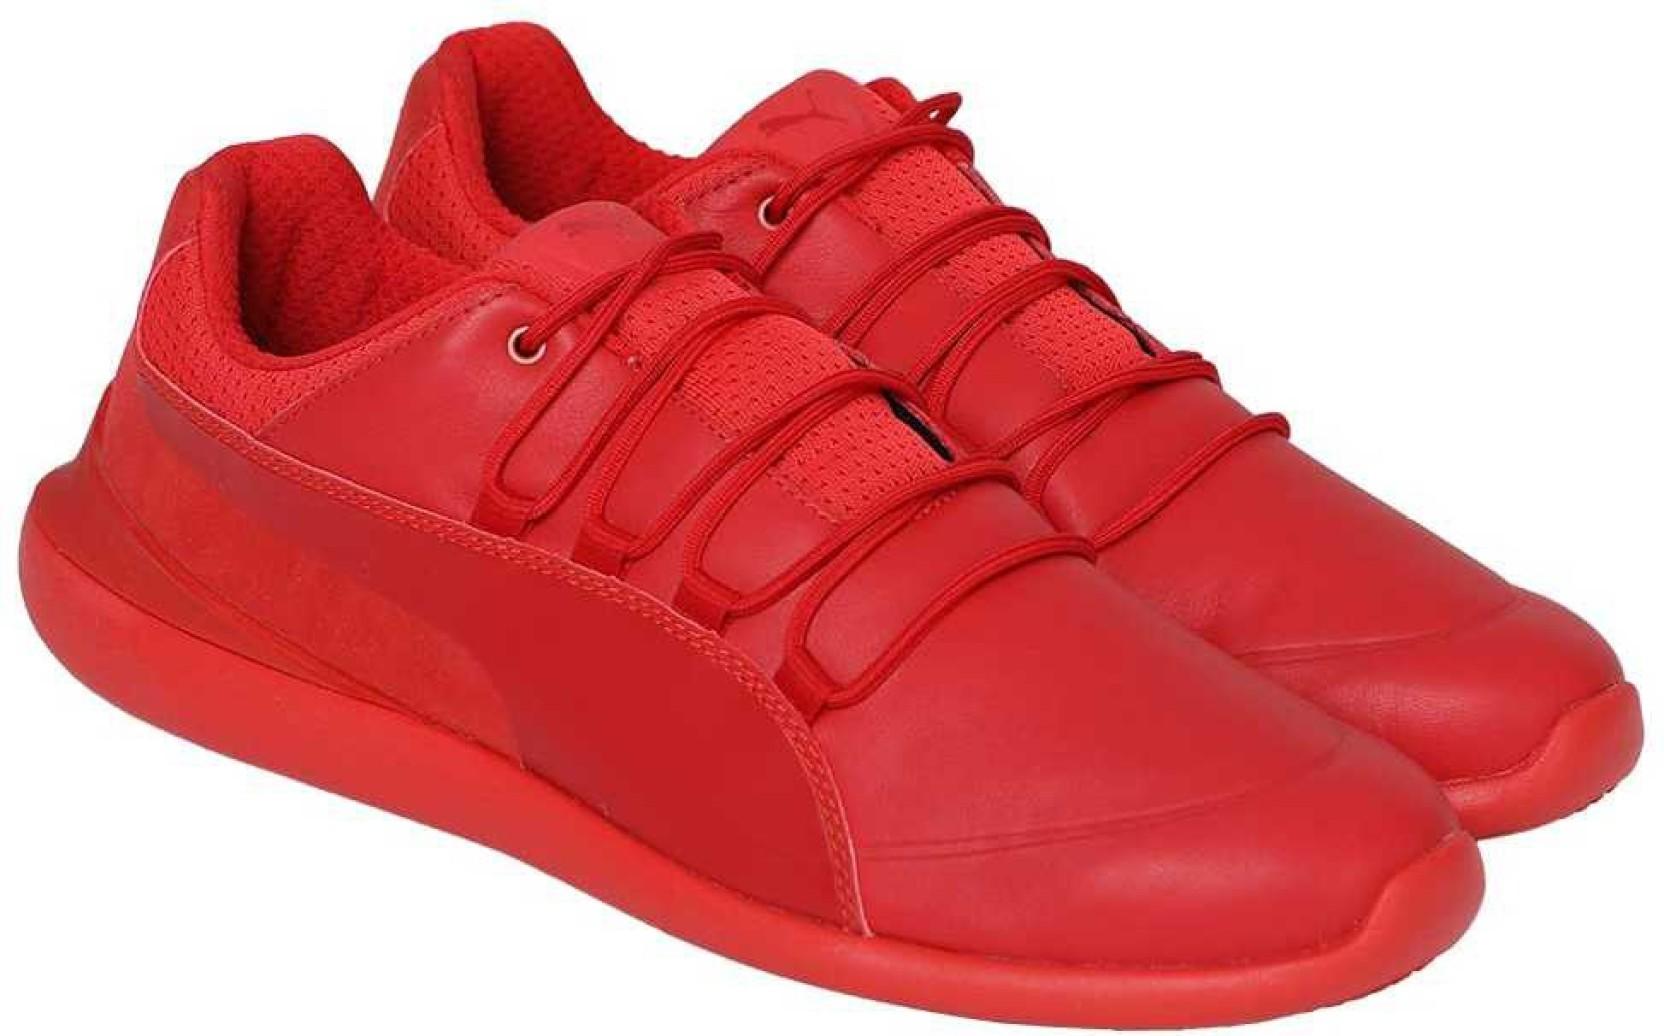 e48a9d3f6a40 Puma SF Evo Cat Walking Shoes For Men - Buy Puma SF Evo Cat Walking ...